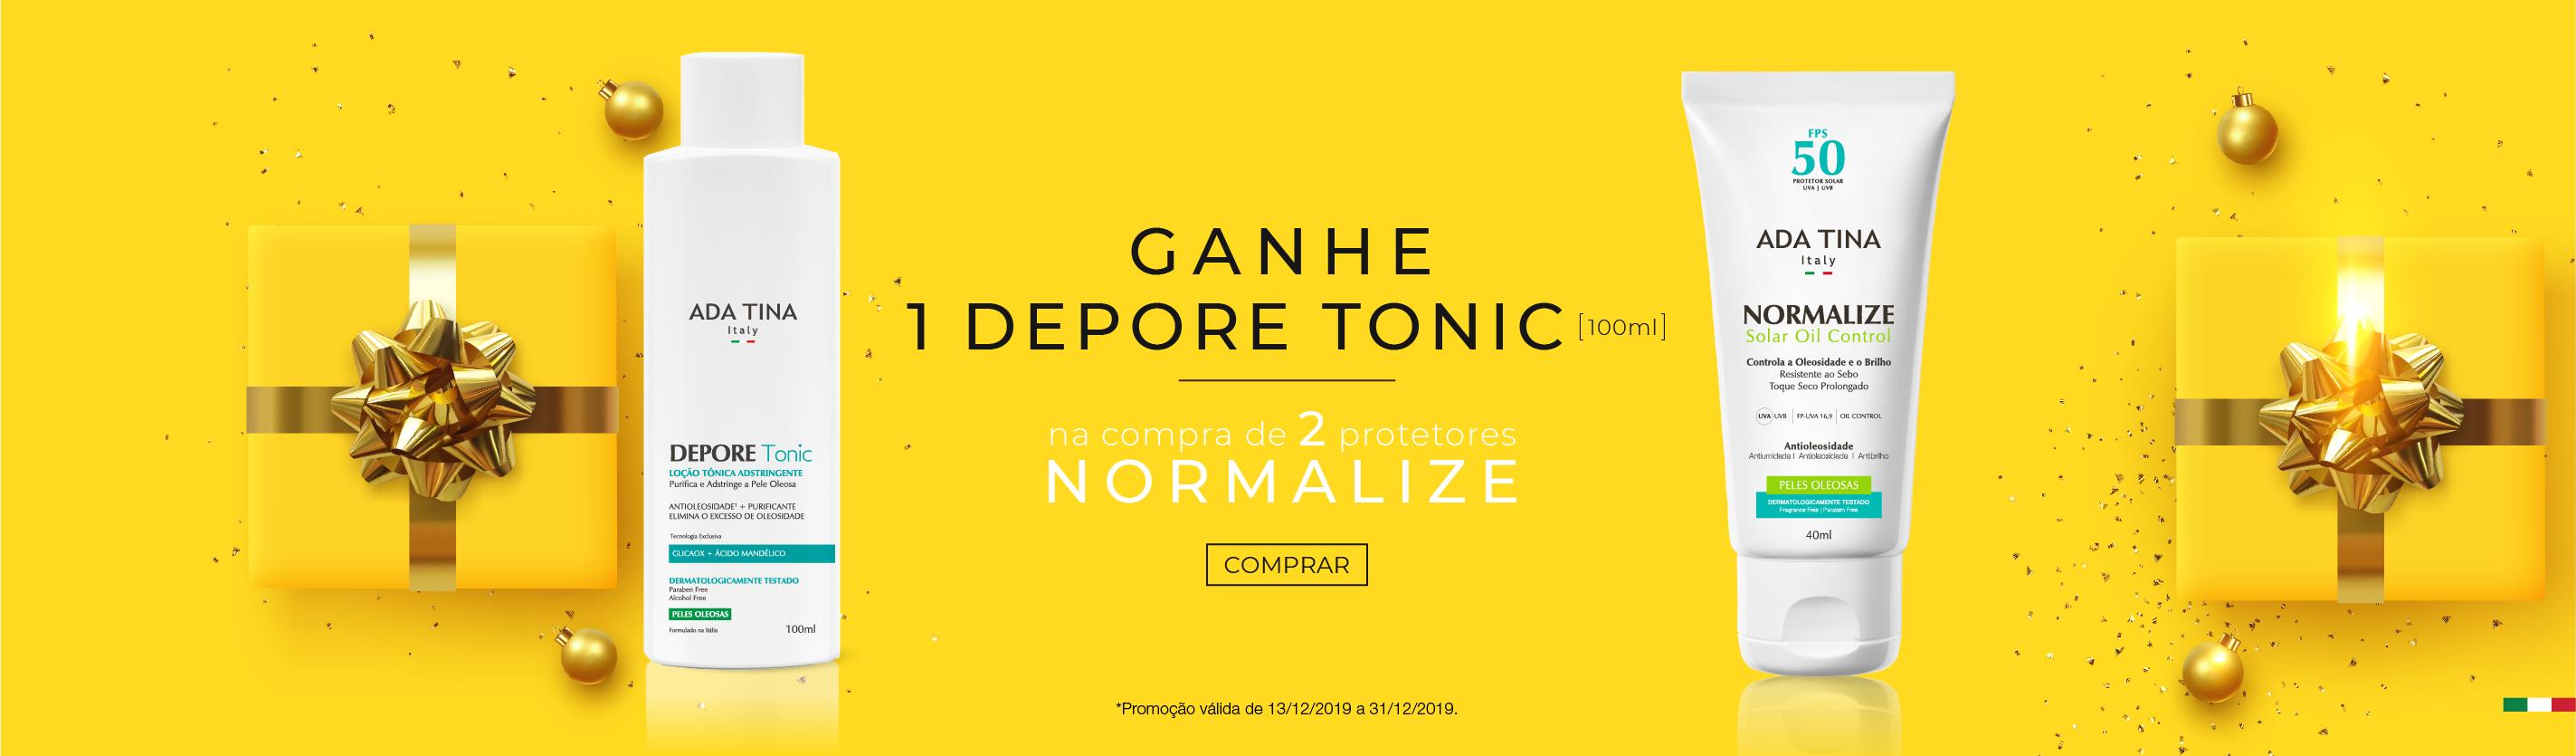 MÉDIO GANHE DEPORE TONIC 100ML